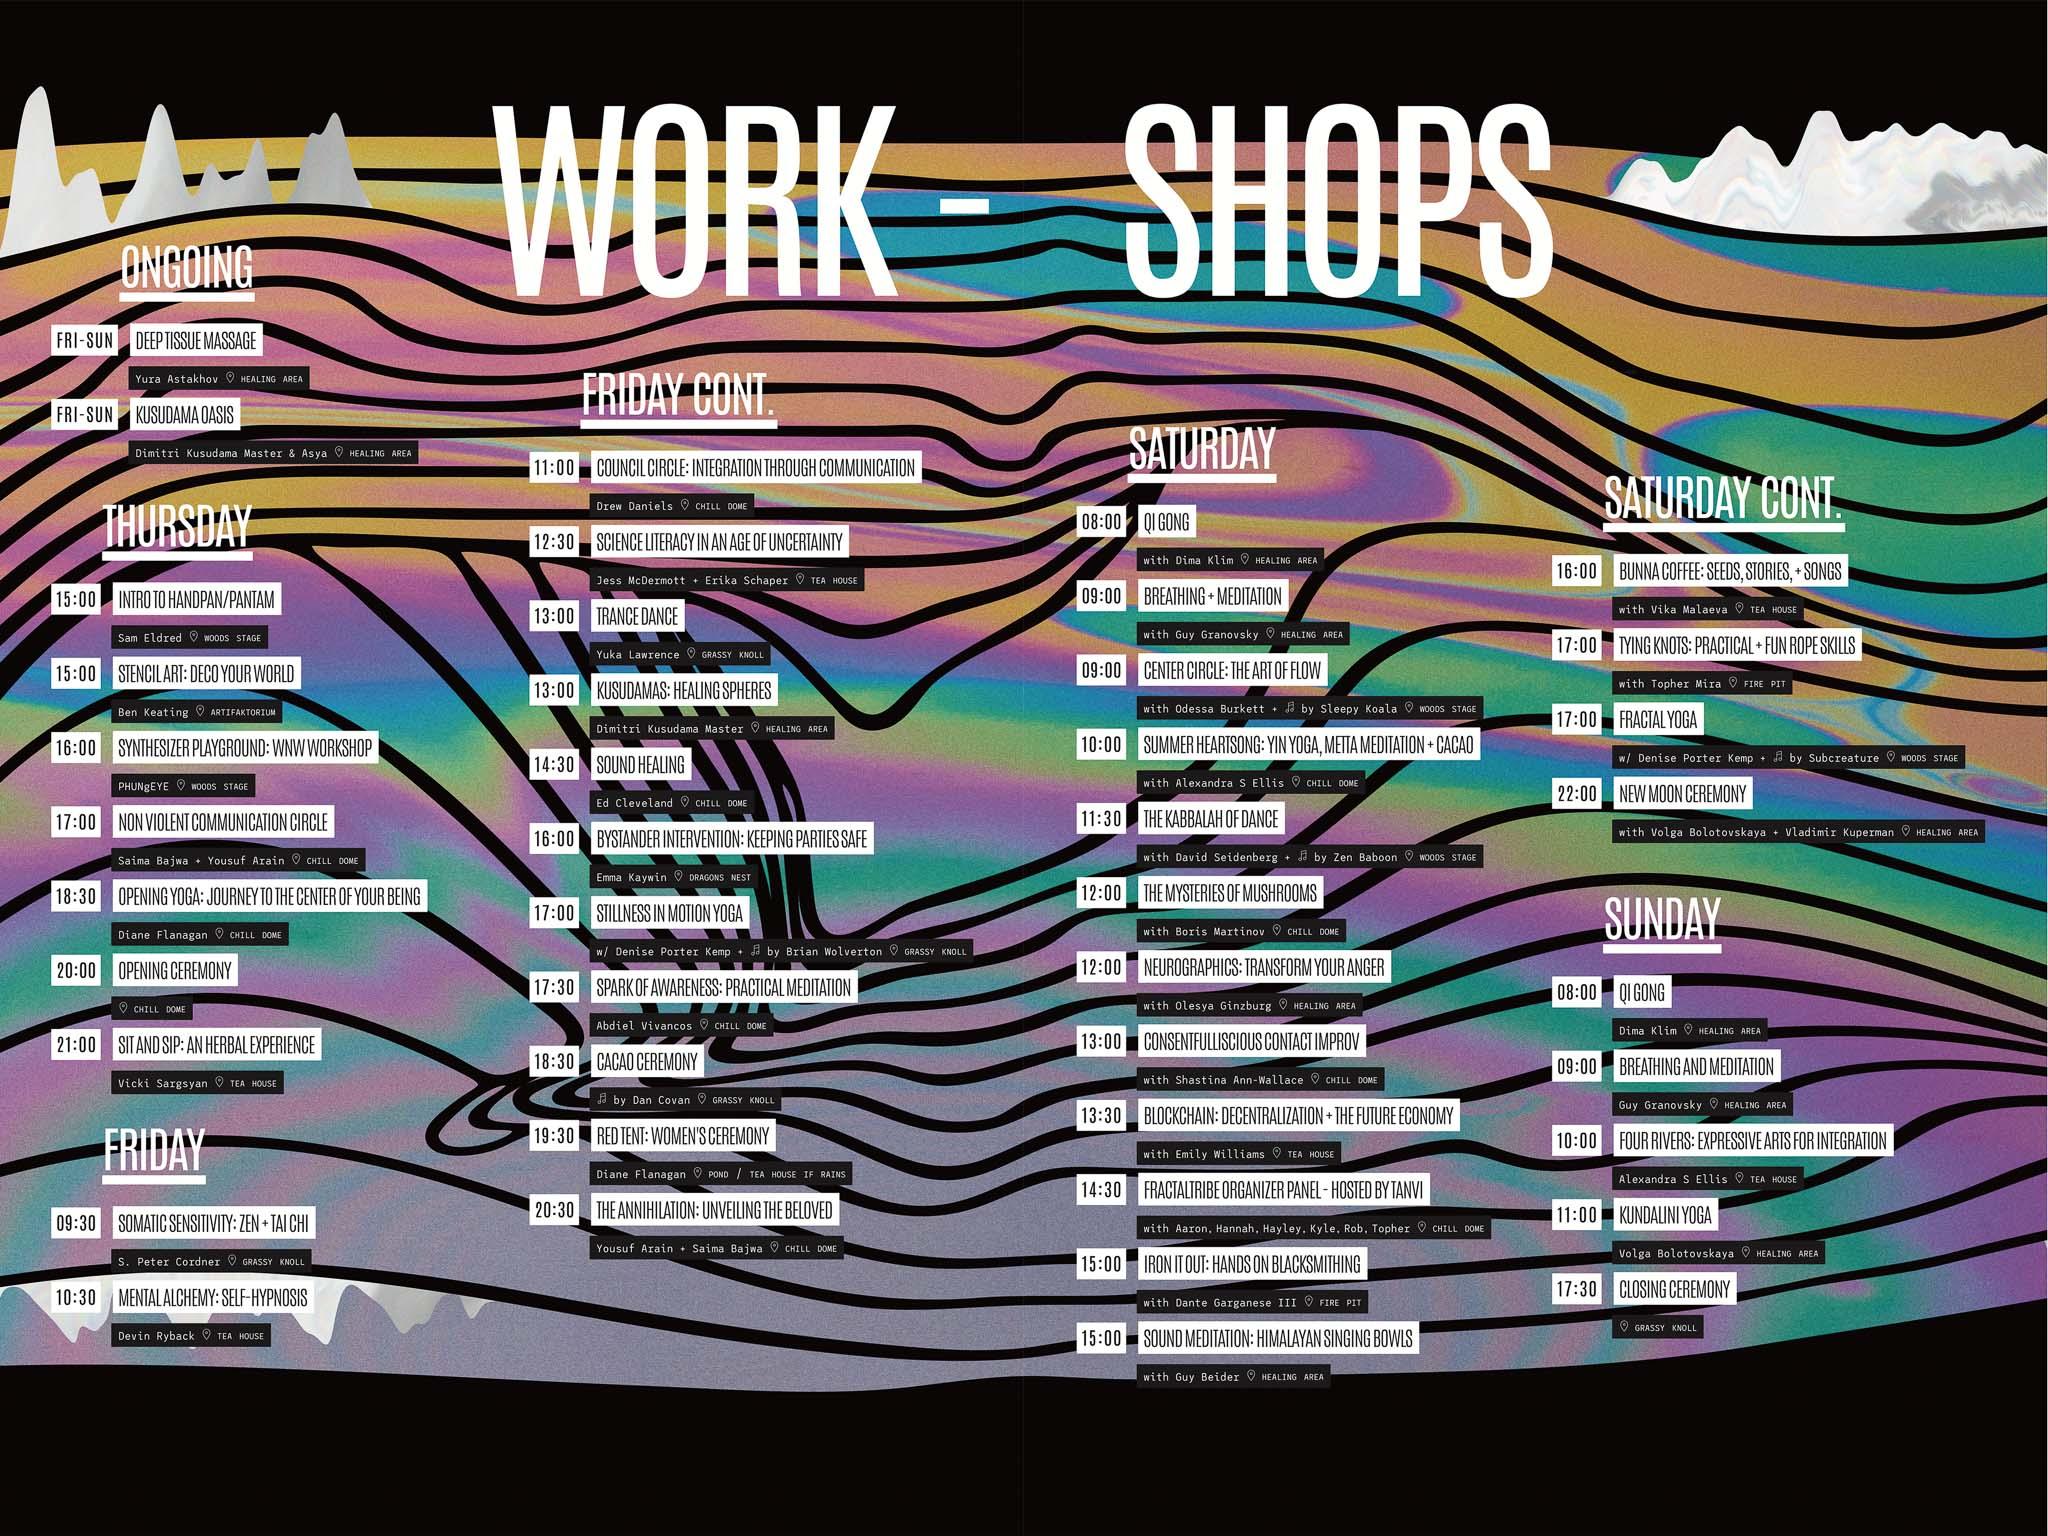 FF18-Kiosk_Schedules-Workshops-WEB-WEB.jpg